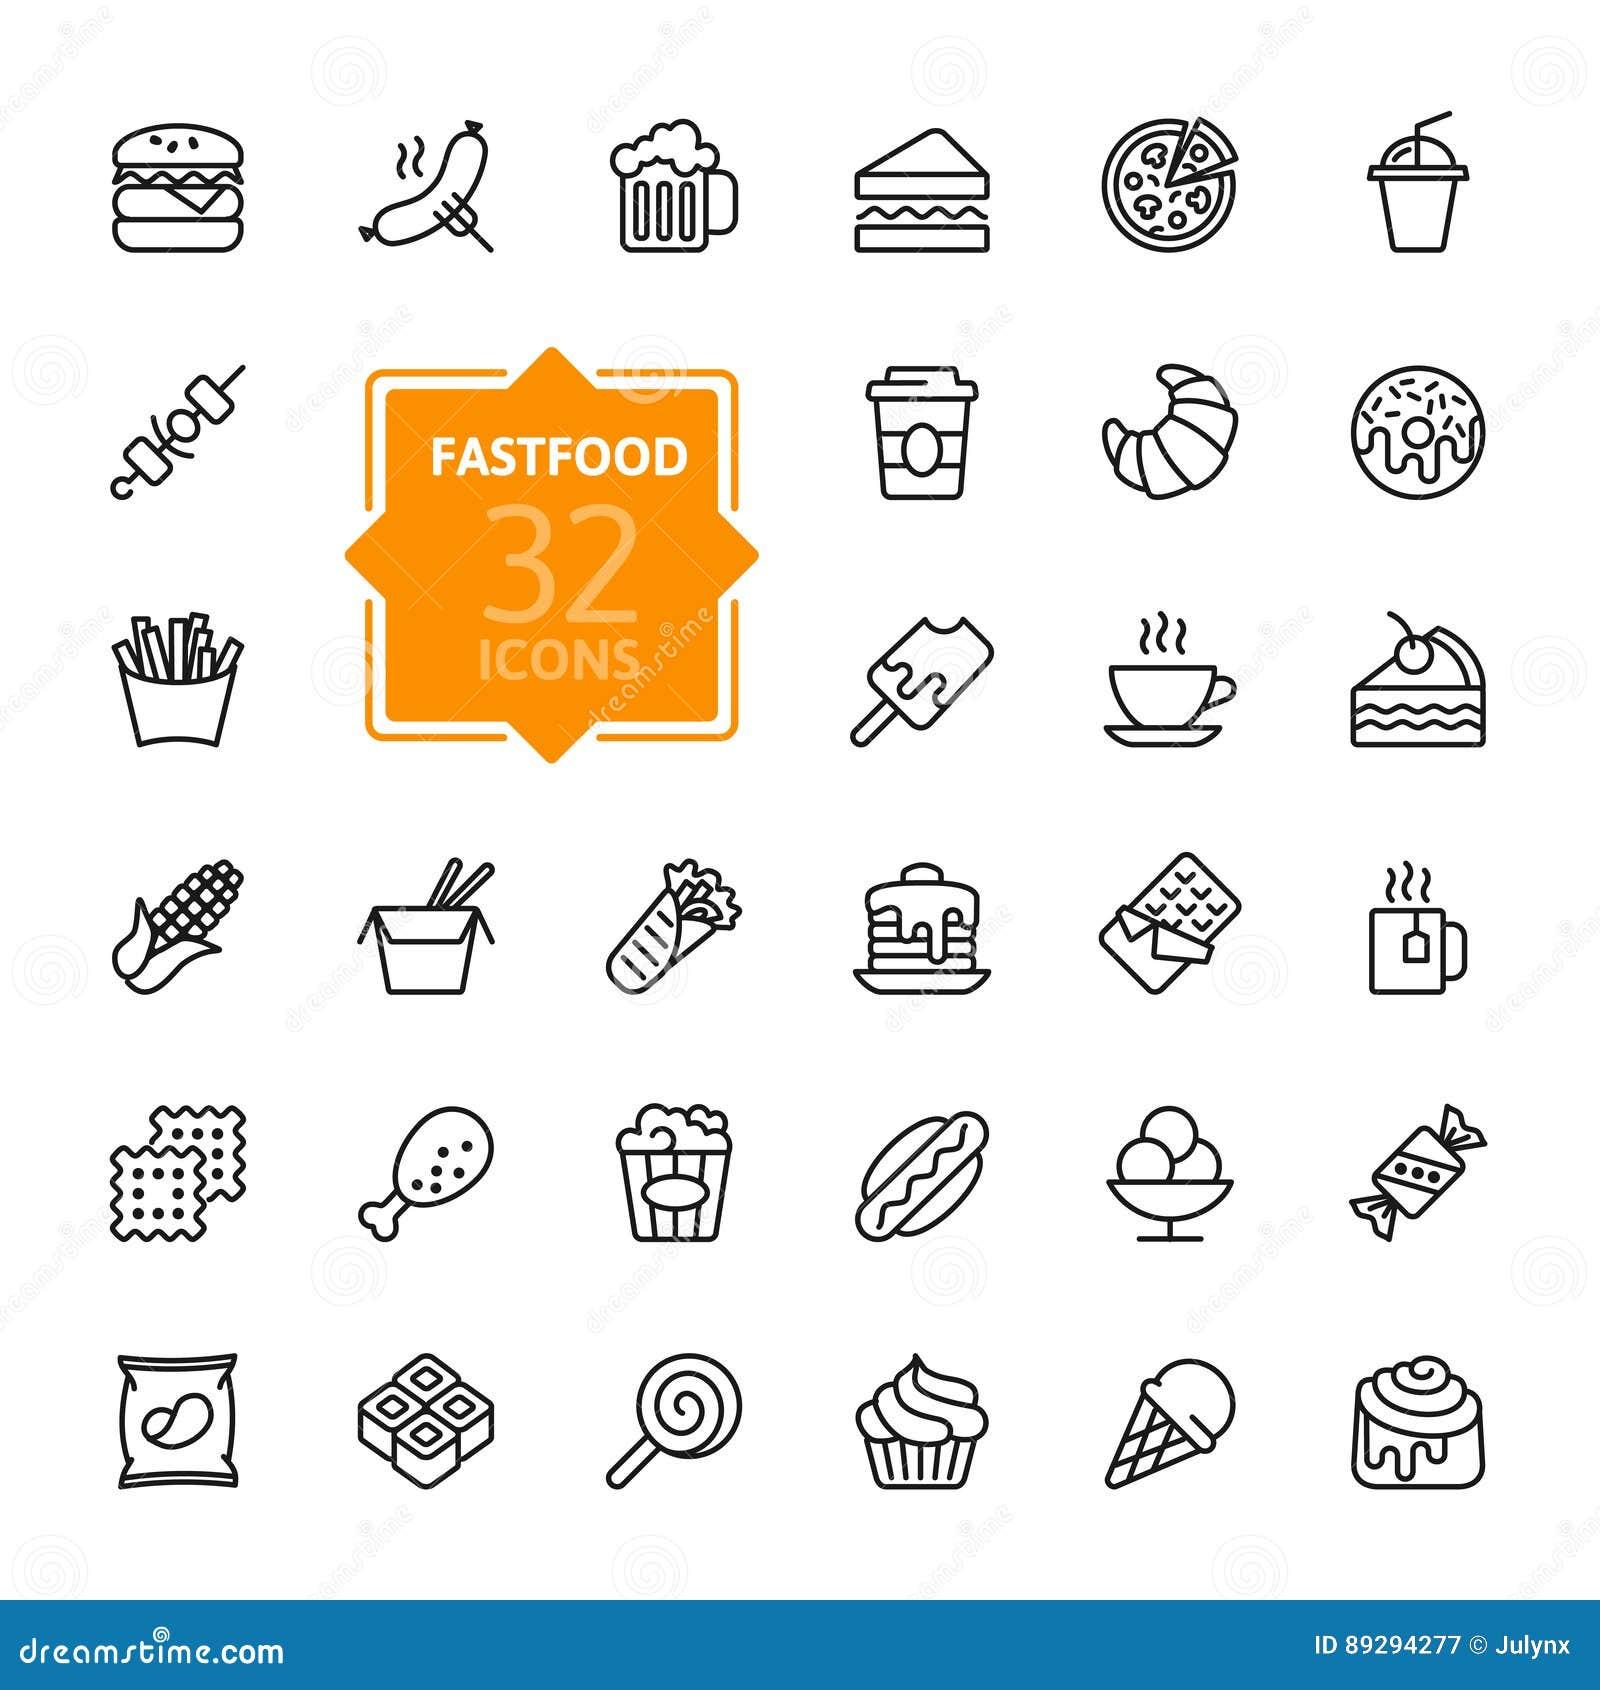 Fastfood - kontur ikony kolekcja, wektor